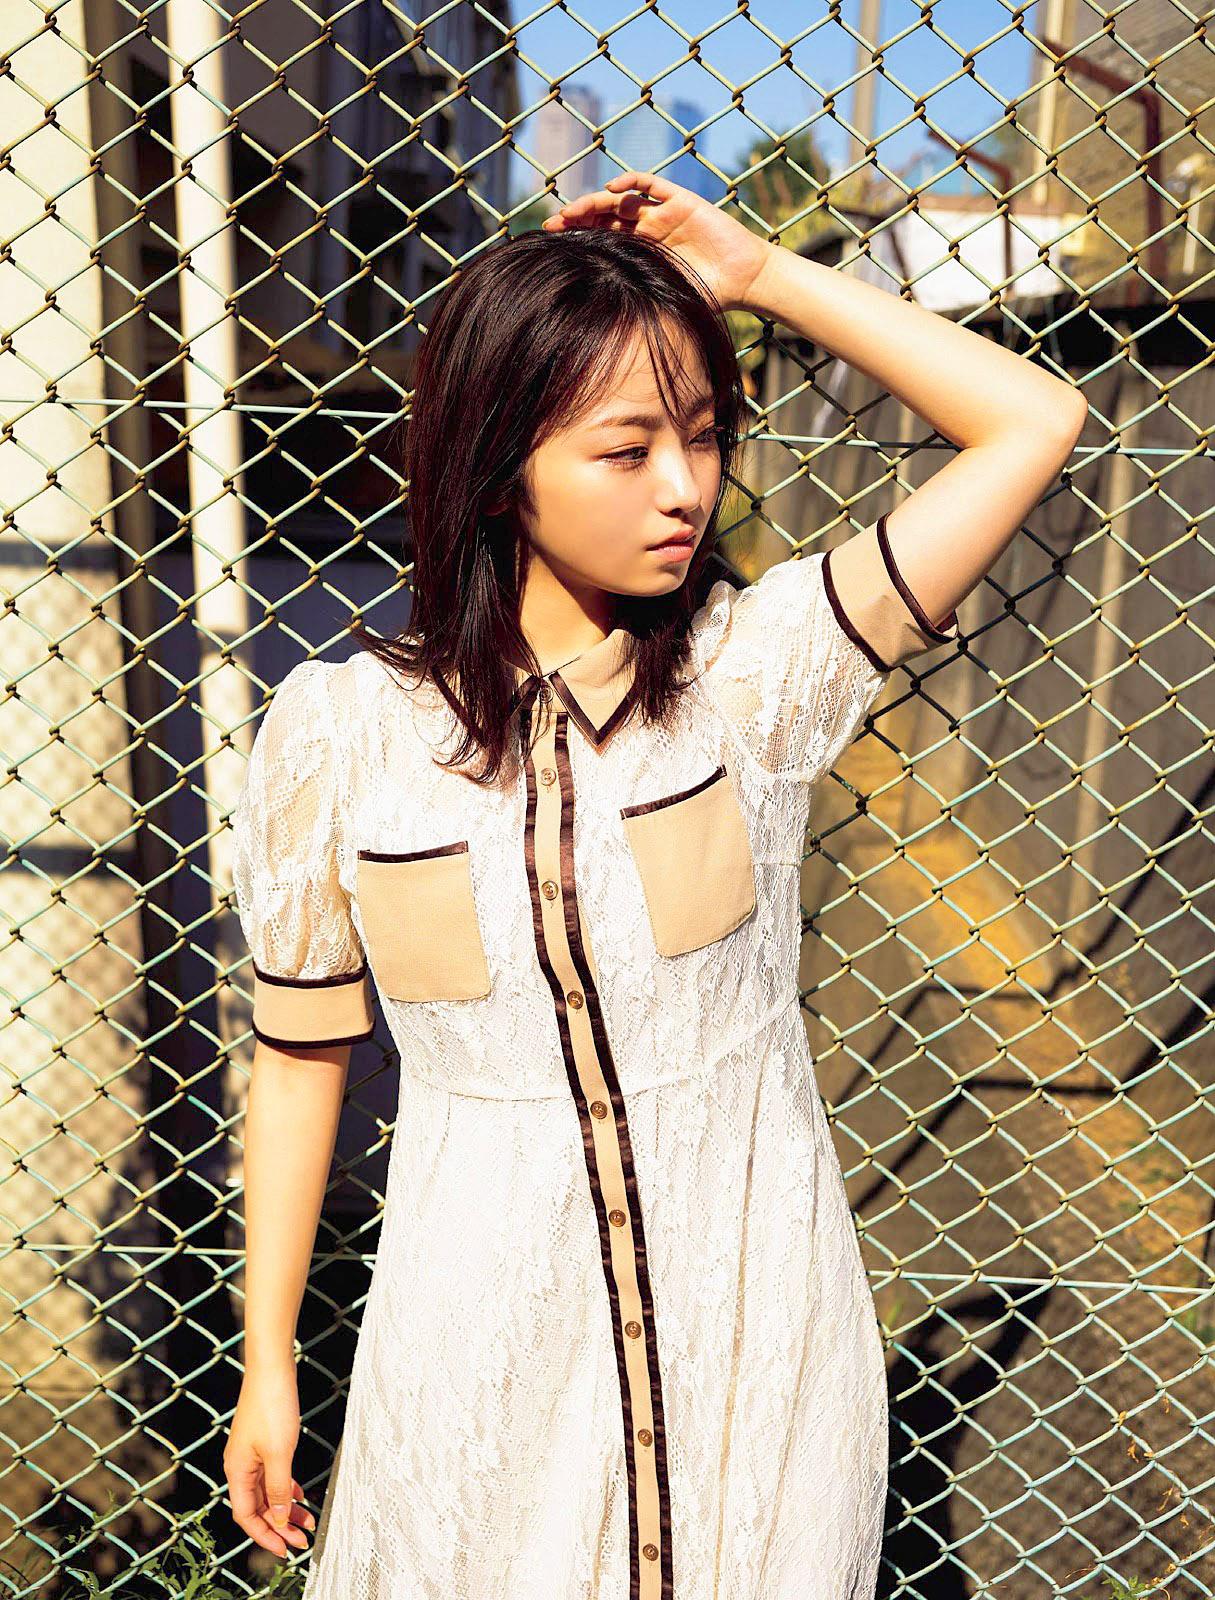 Yui Imaizumi Flash 191105 05.jpg